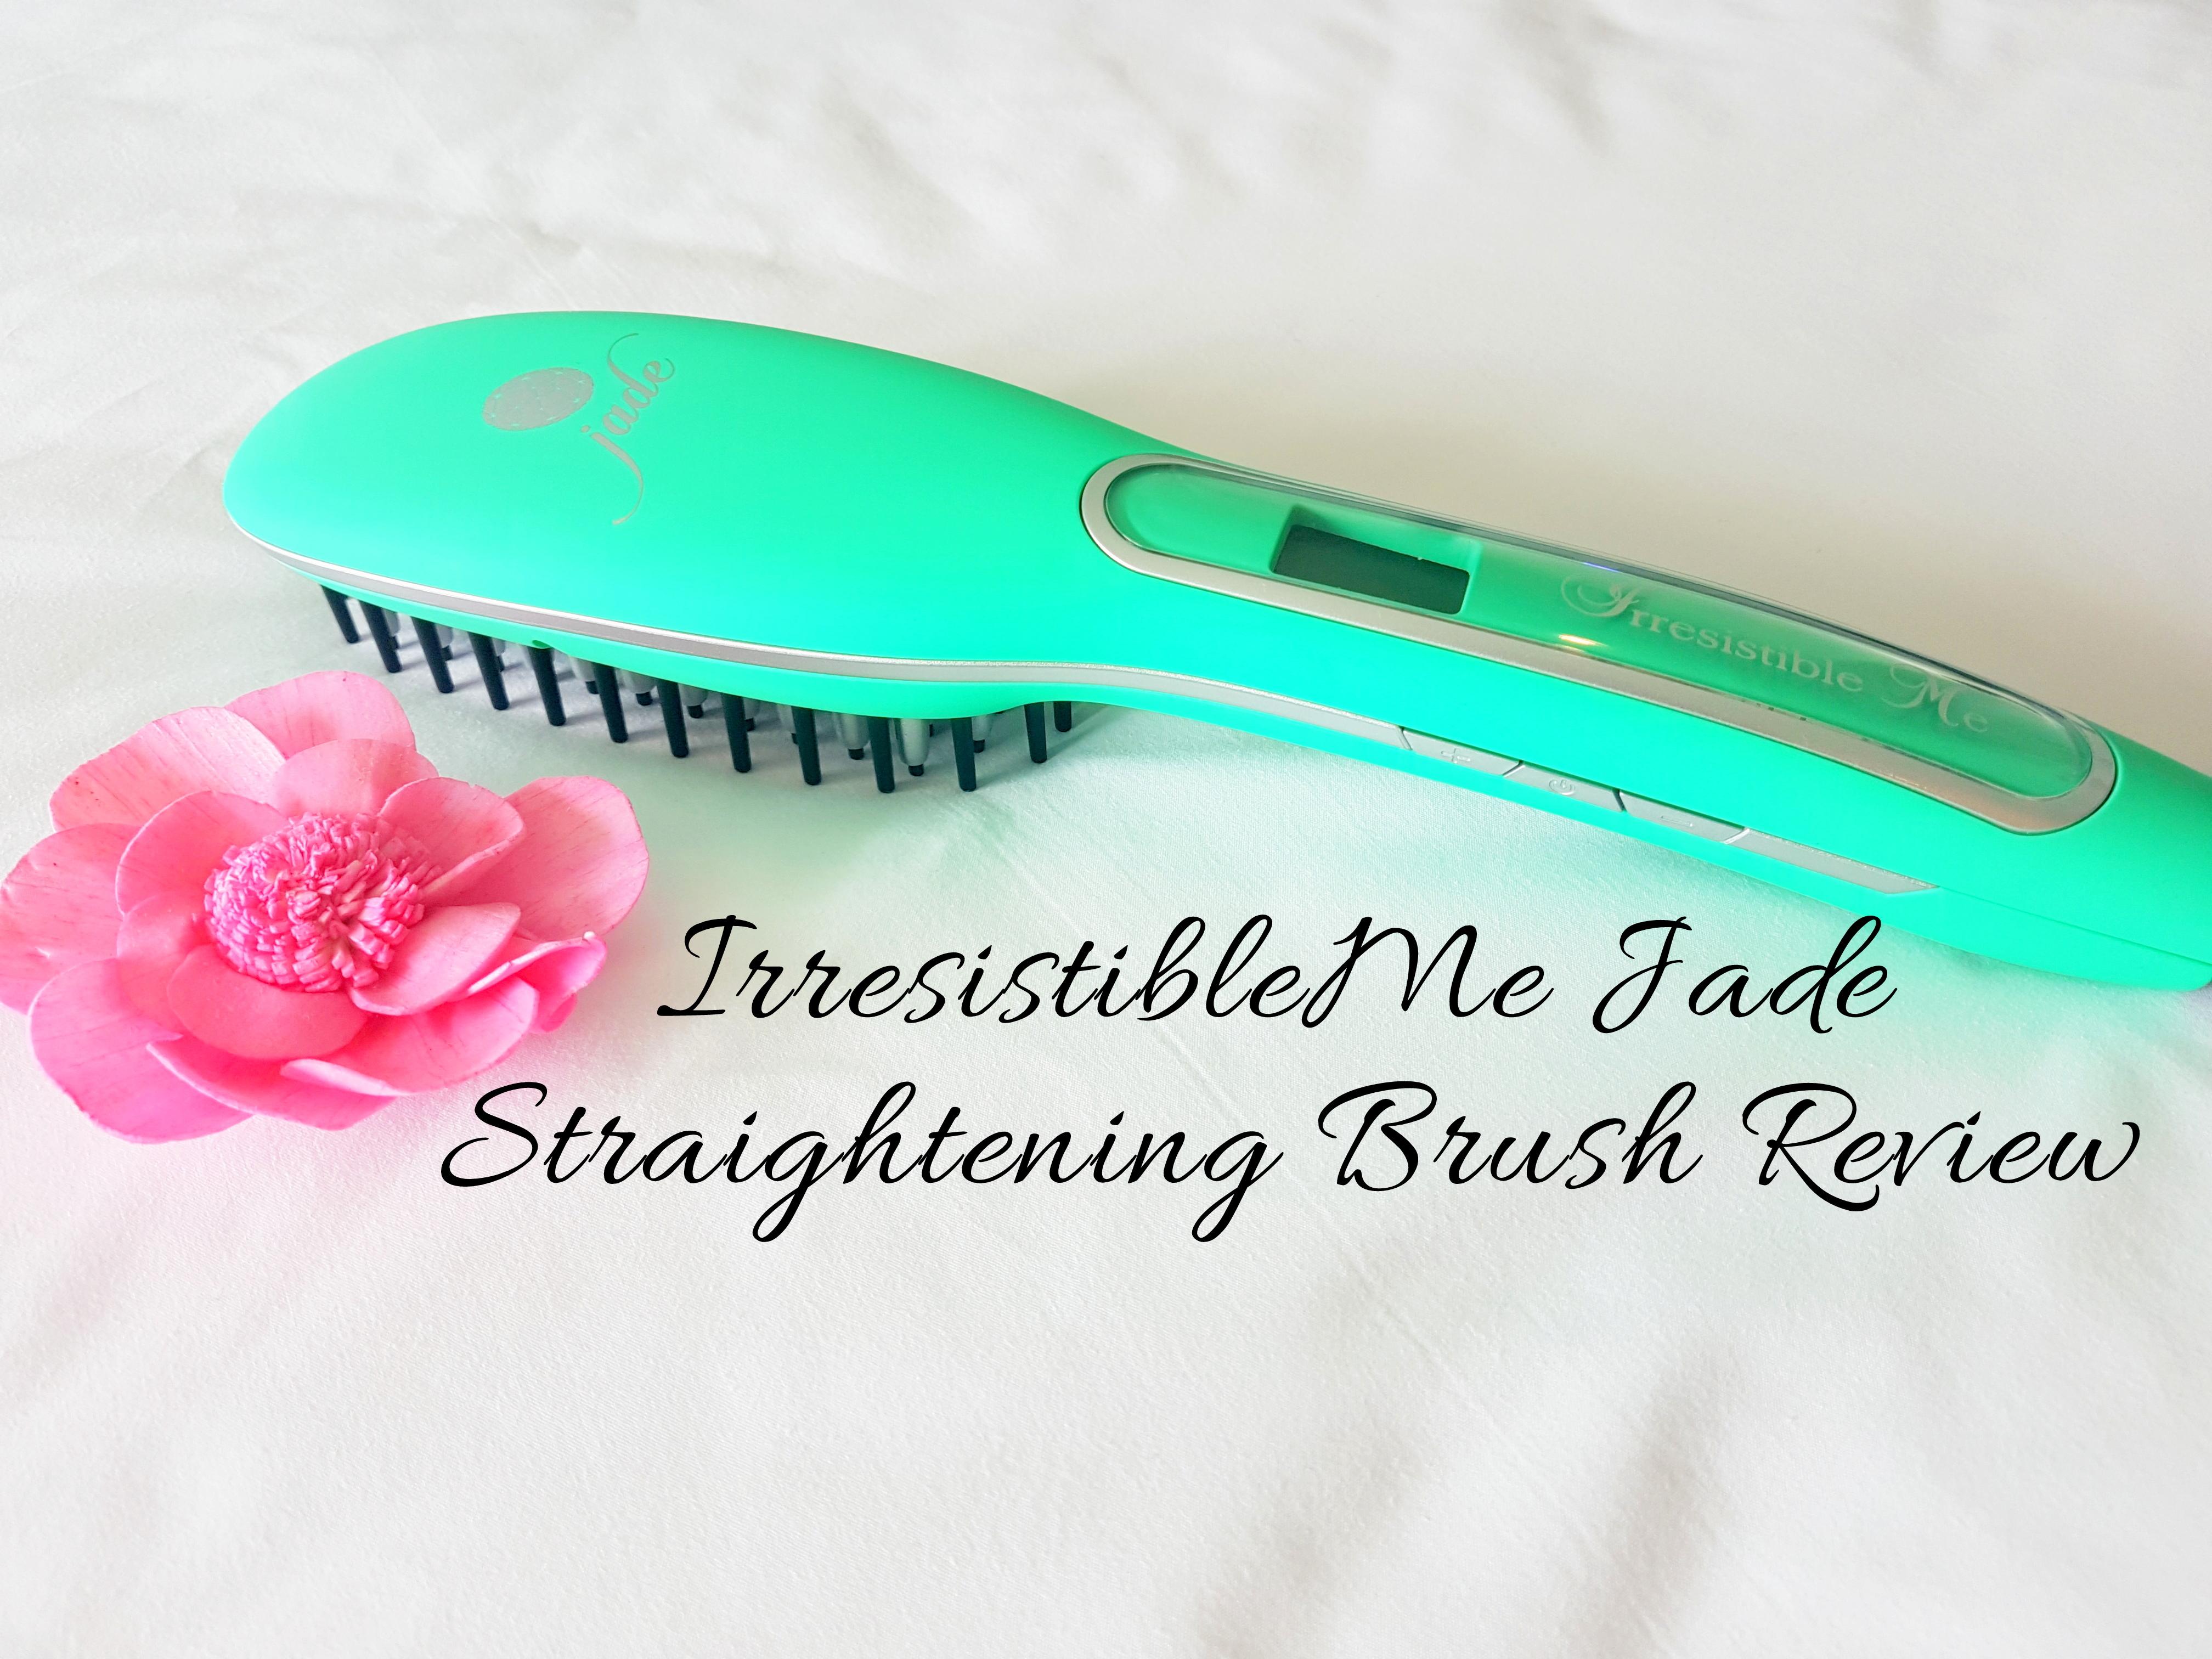 Irresistibleme Jade Straightening Brush Review